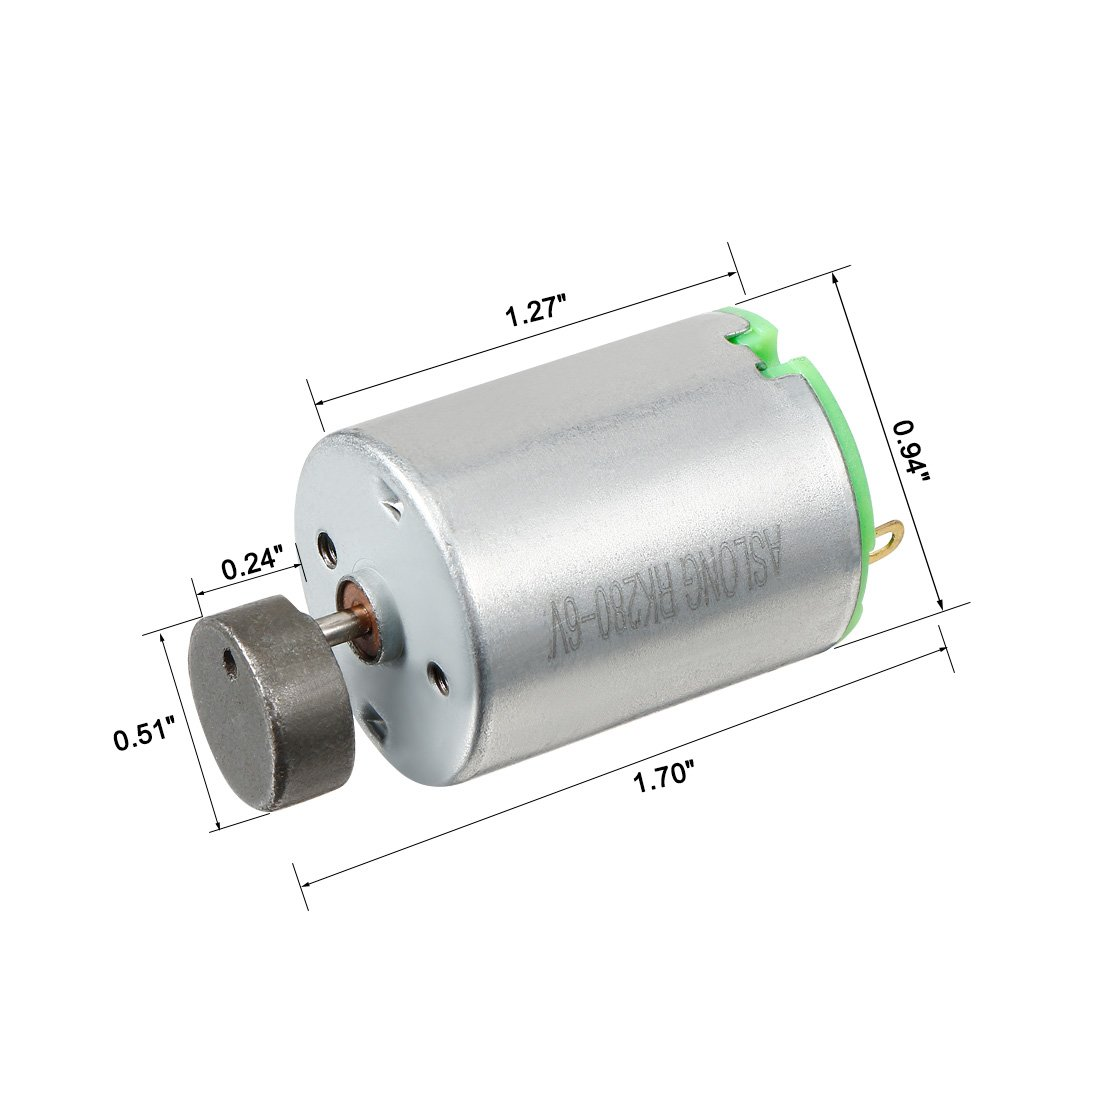 DC 1.5-6V 50000RPM Micro Coreless Vibrating Motor 6x14mm for Toys DIY